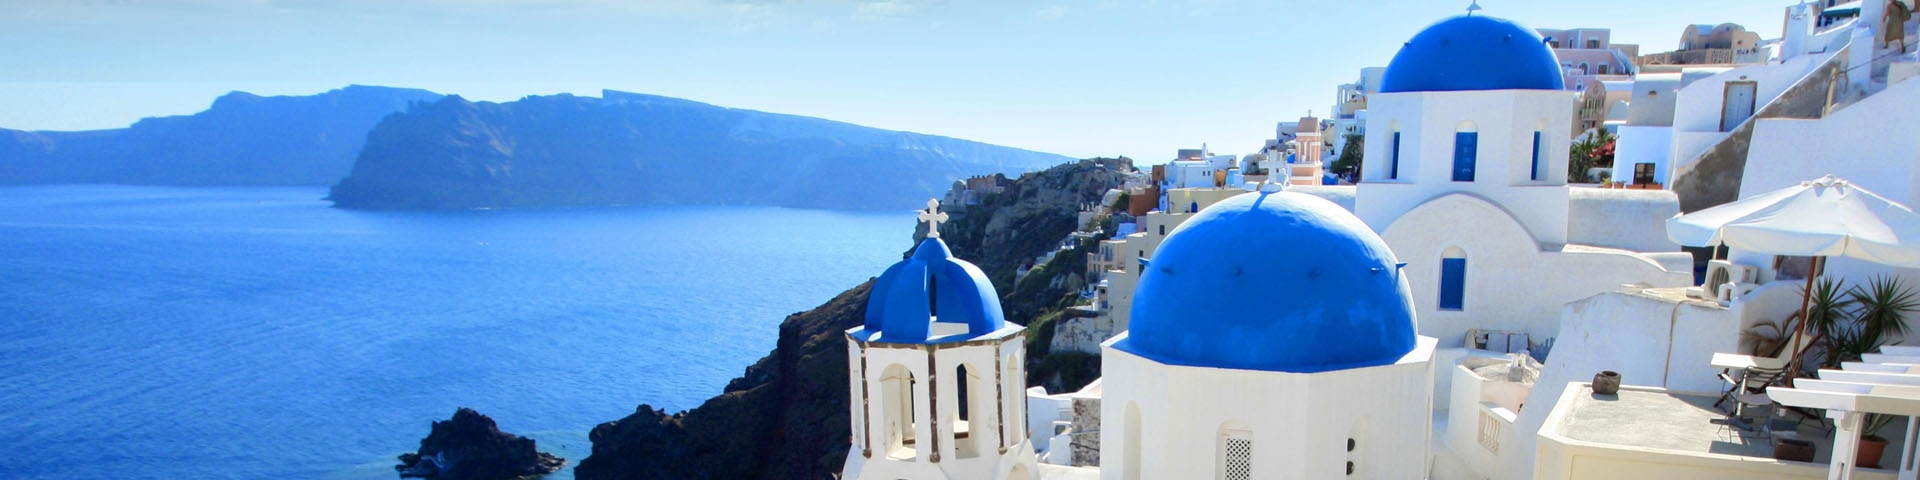 Turquia e Islas Griegas